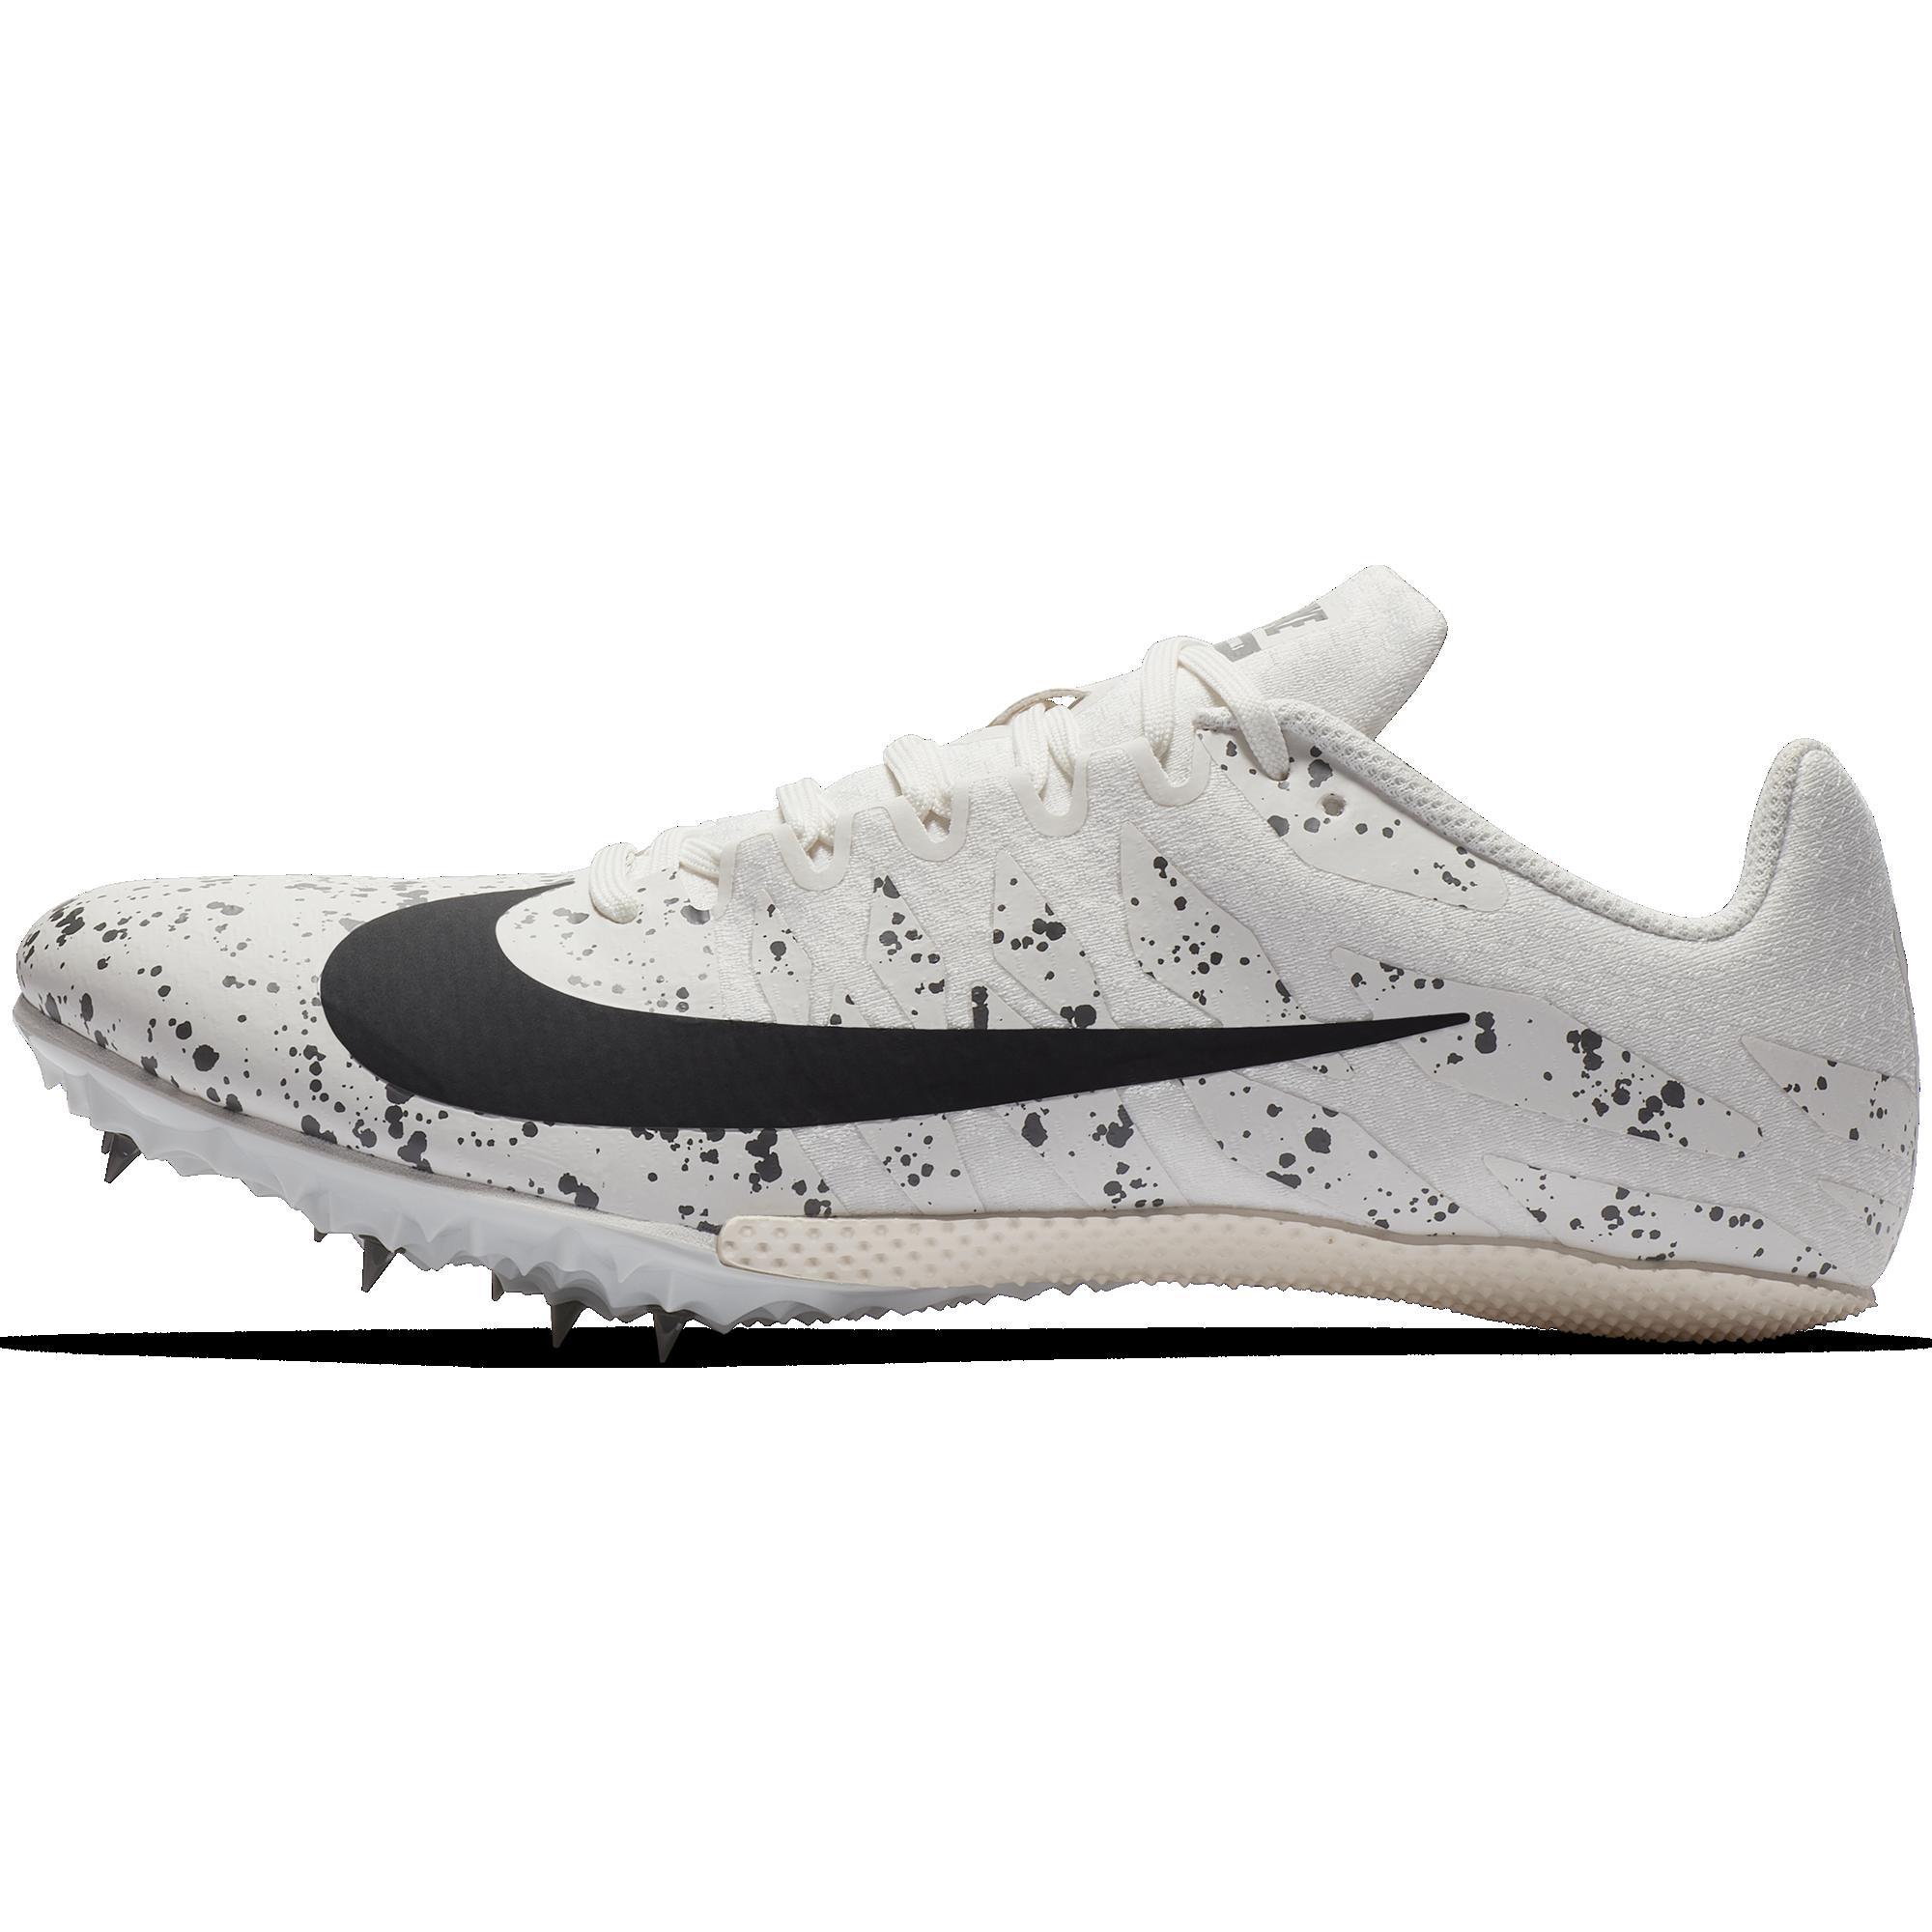 S Rival Nike Leichtathletik 9 Zoom Schuhe kwPuXiOZT